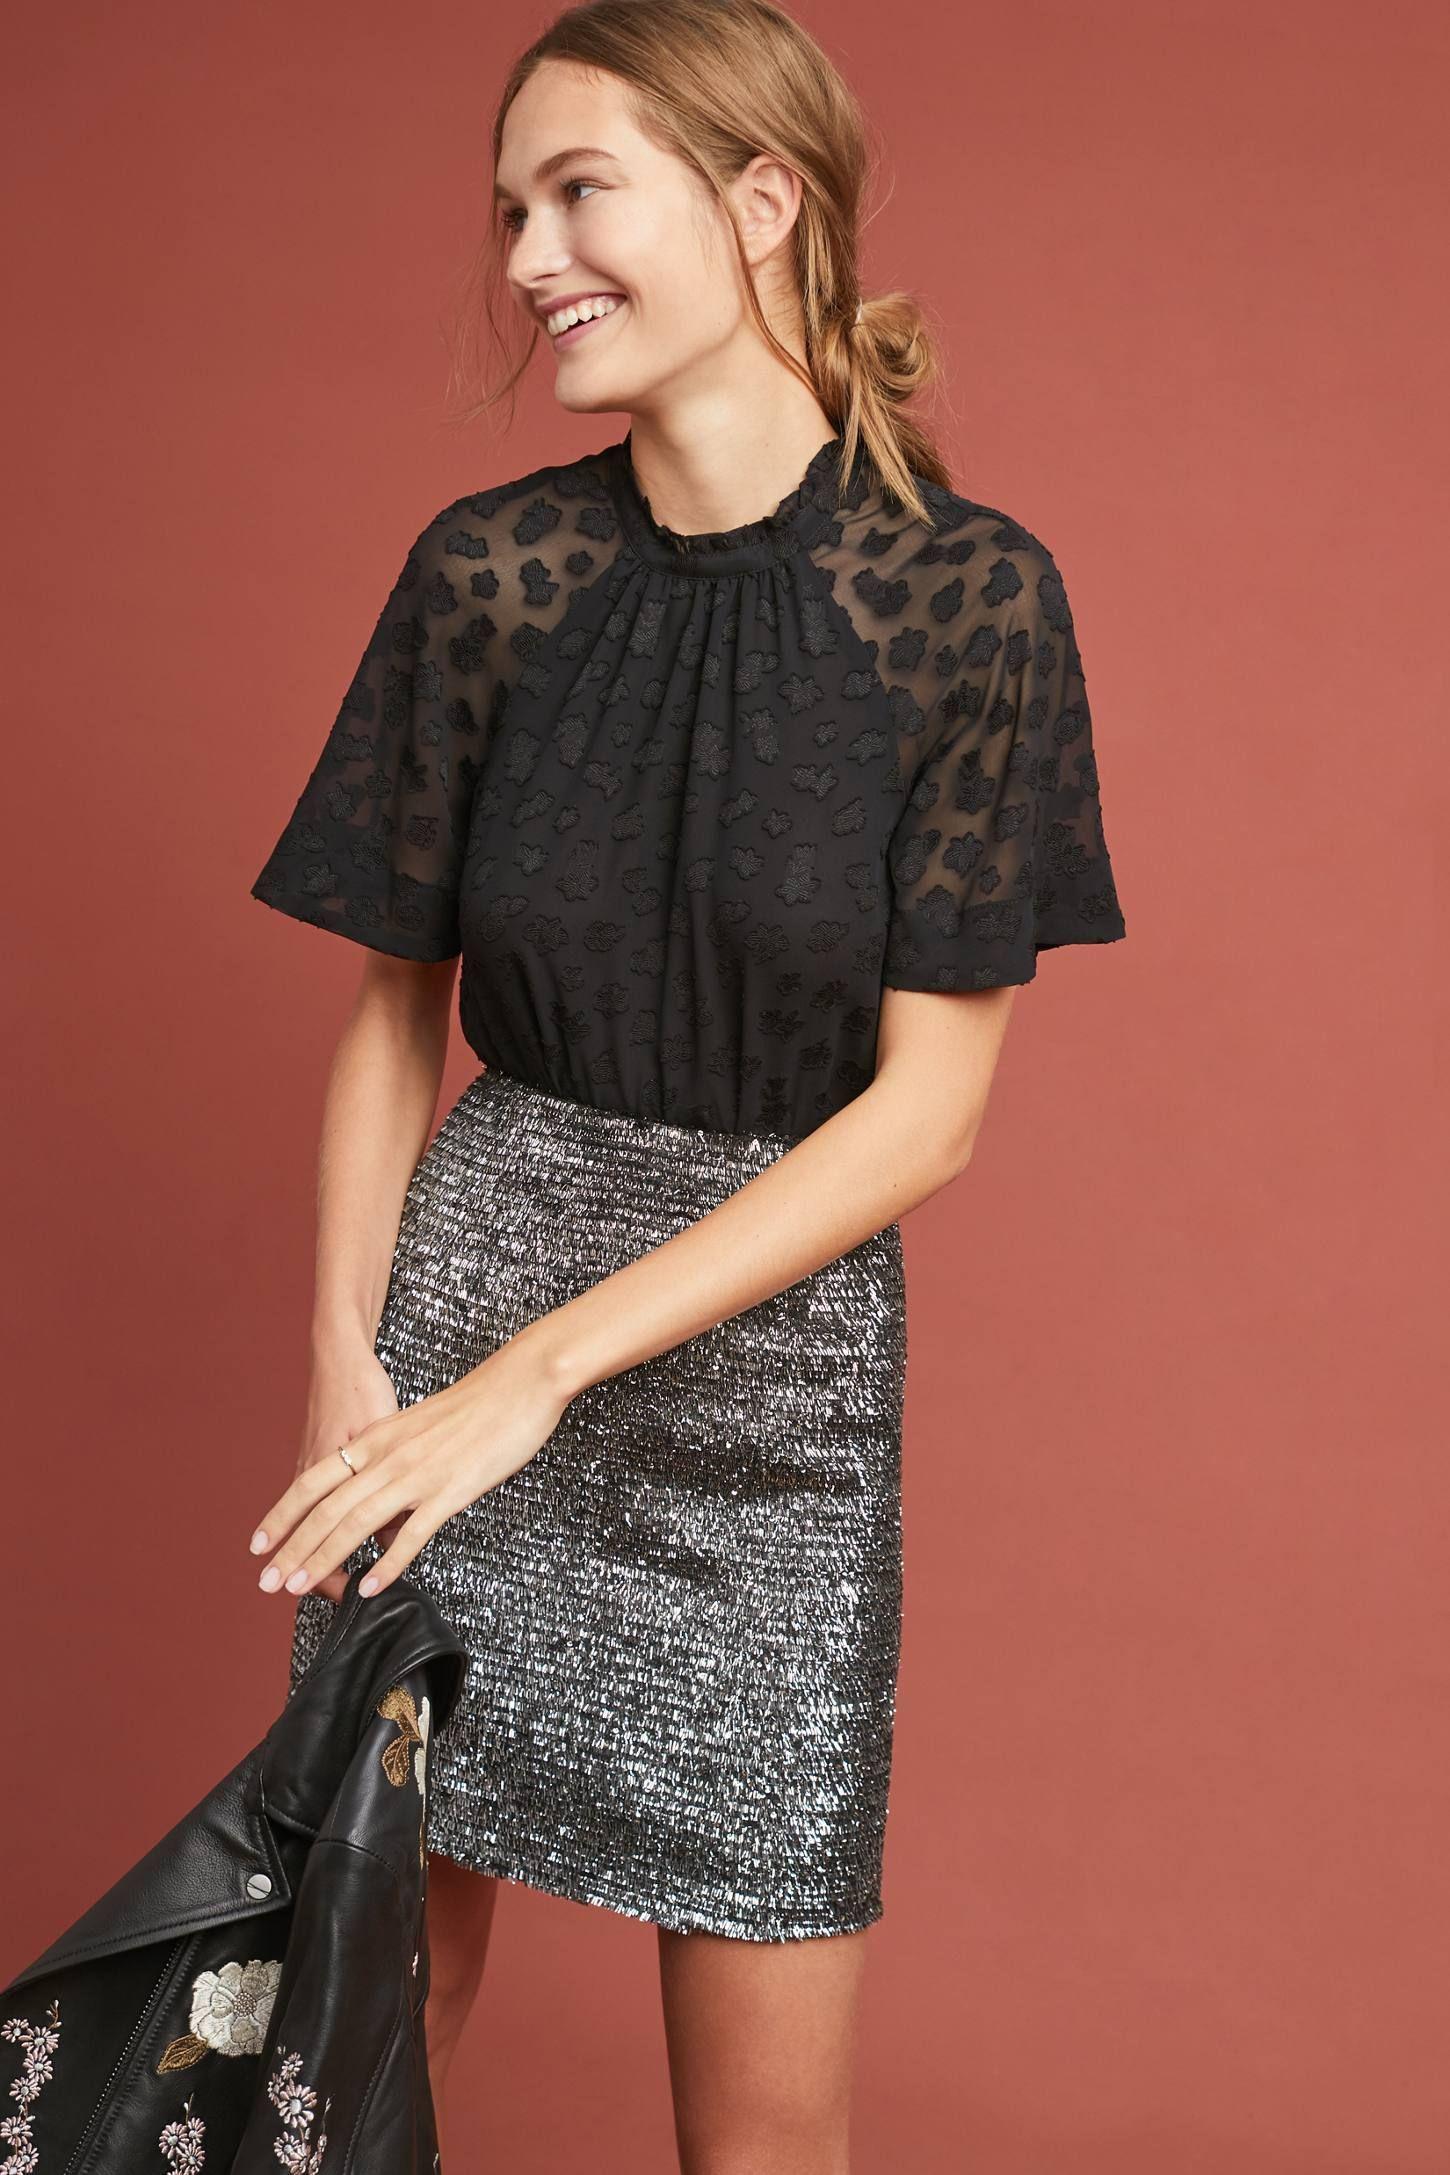 Chatelet blouse fashion style pinterest fashion style and